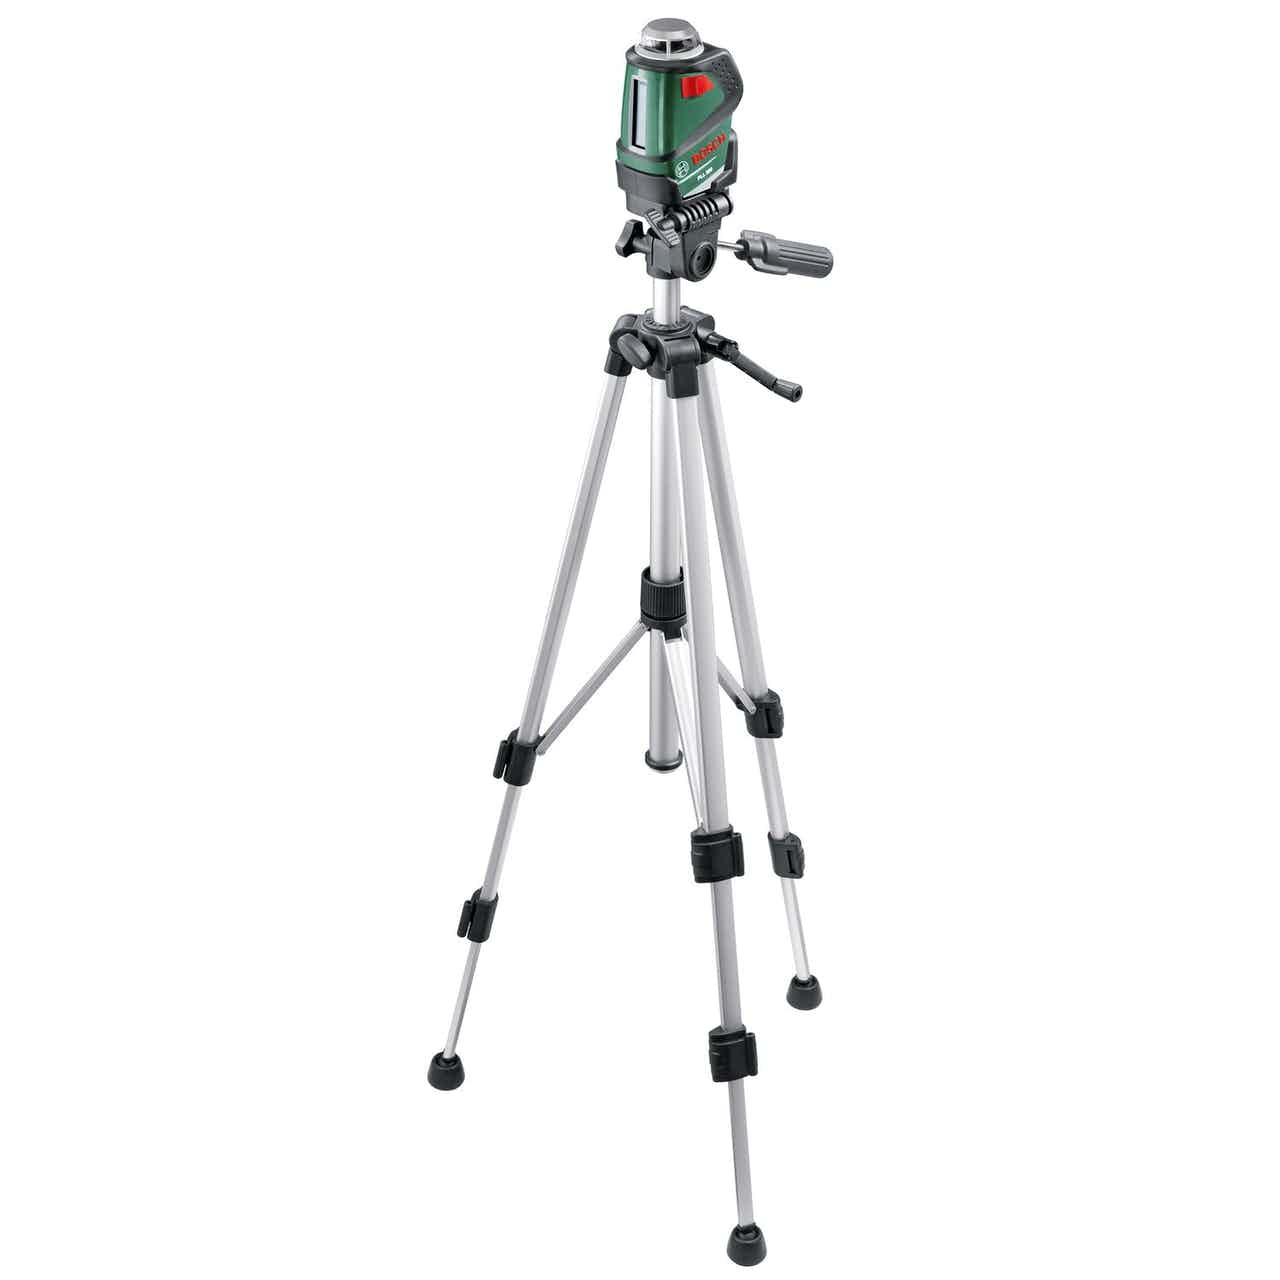 Bosch Linienlaser PLL 360 Set inkl. Stativ, Tasche & Batterien